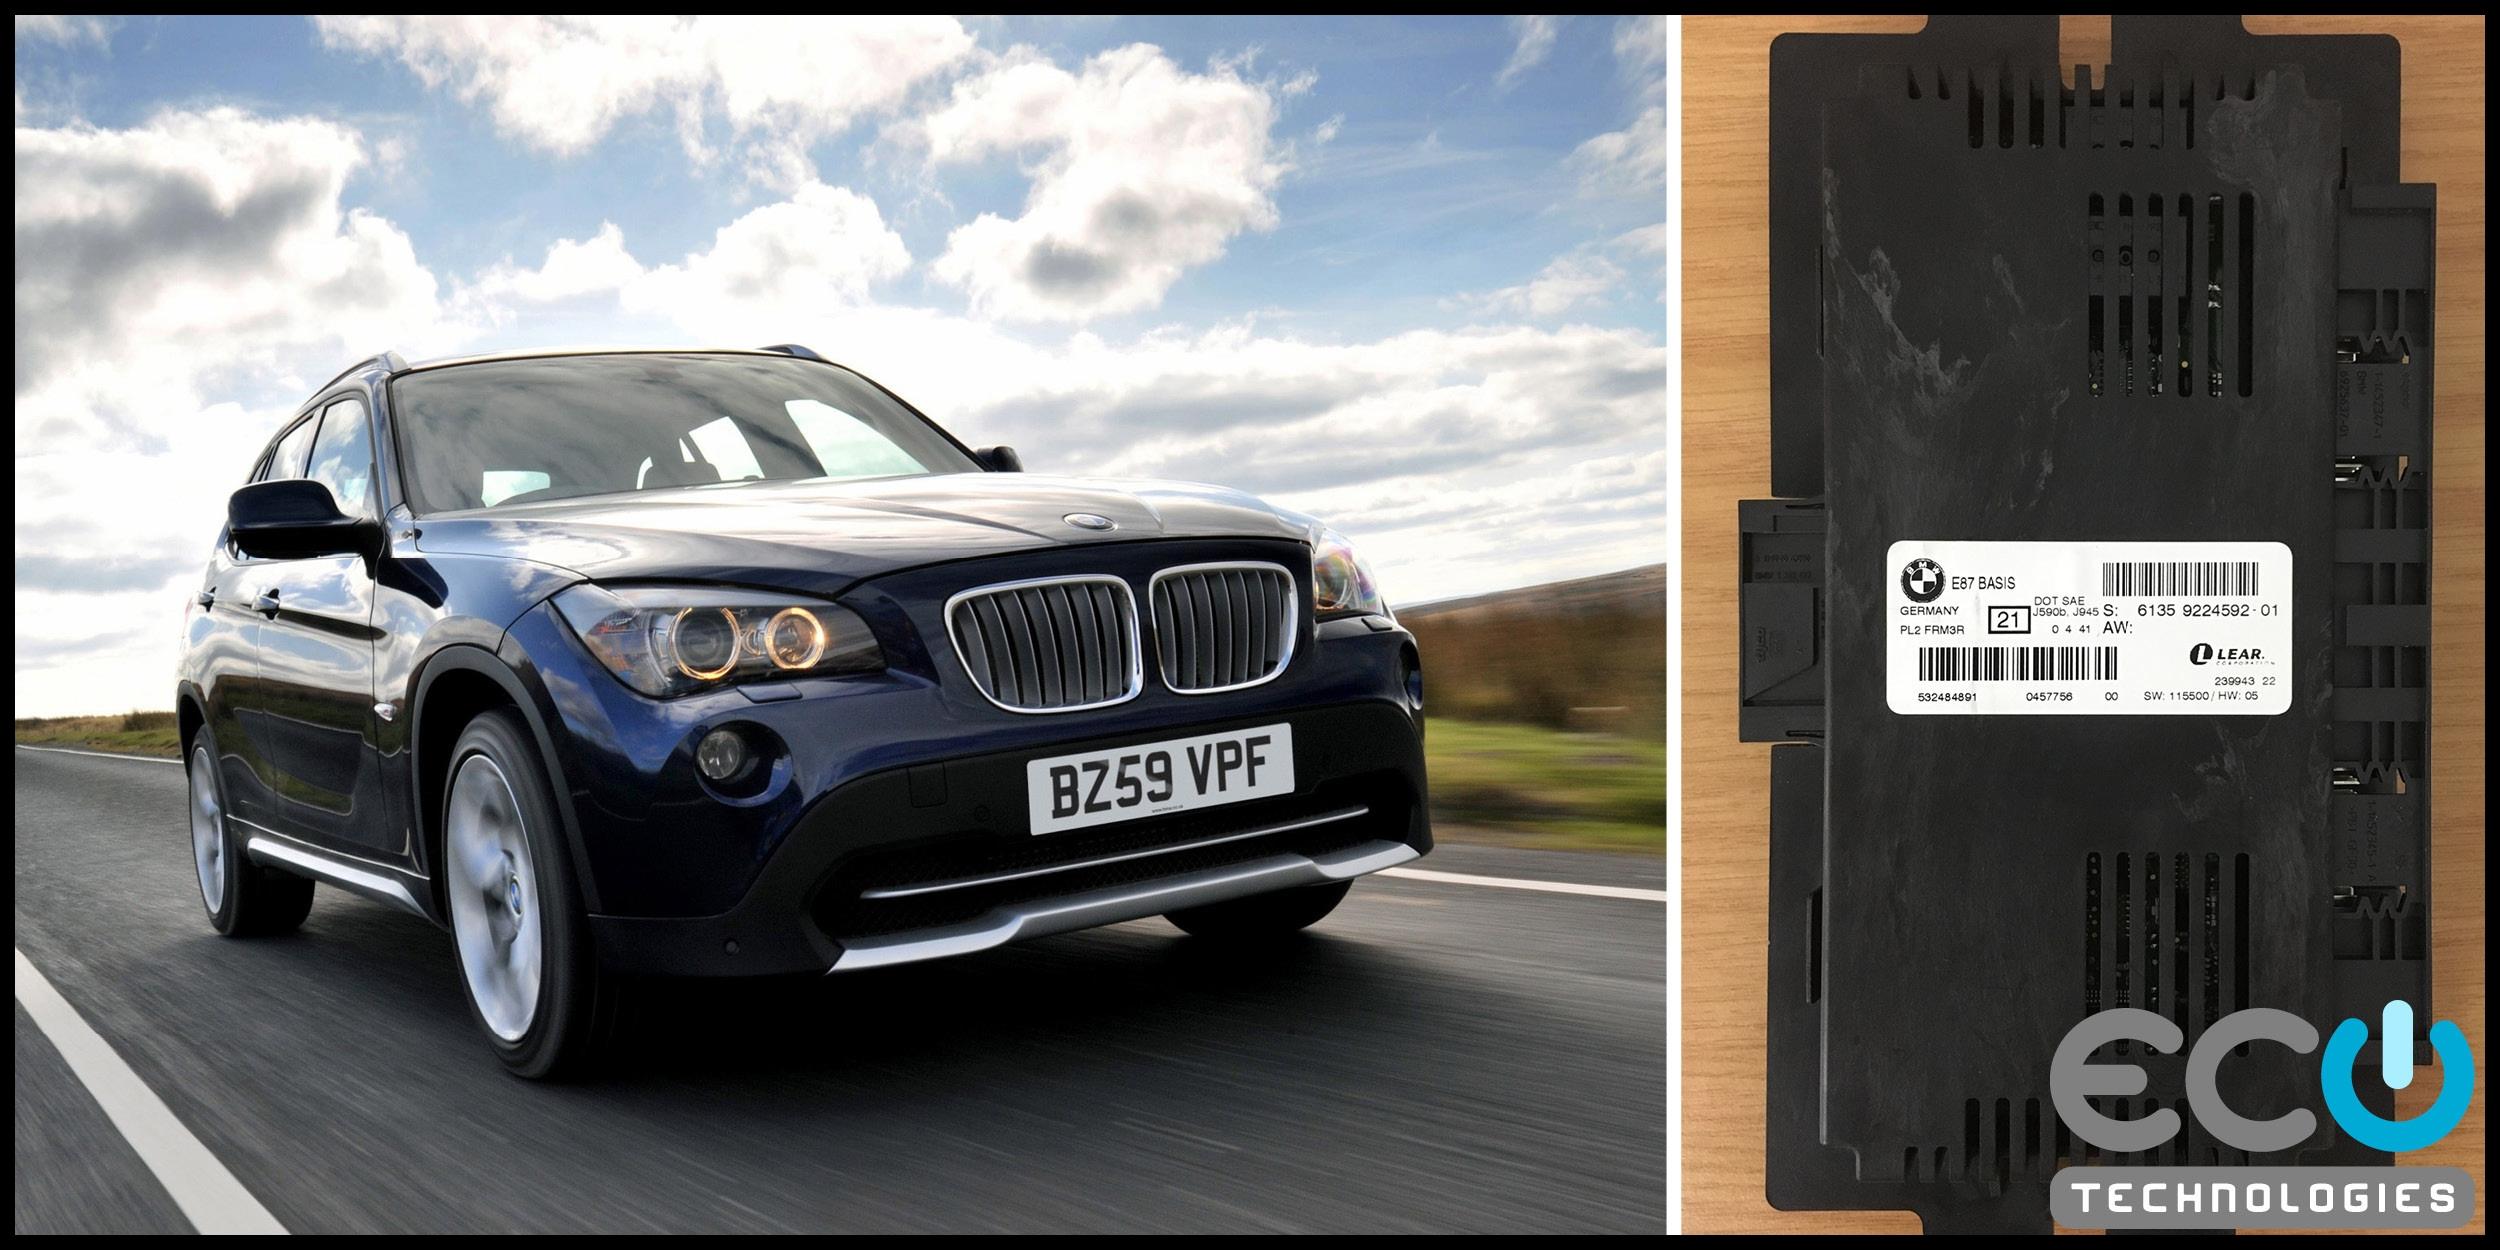 Bmw Approved Mechanics Luxury Bmw X1 E84 2 0d Frm3 E87 Basis 6135 01 Repair